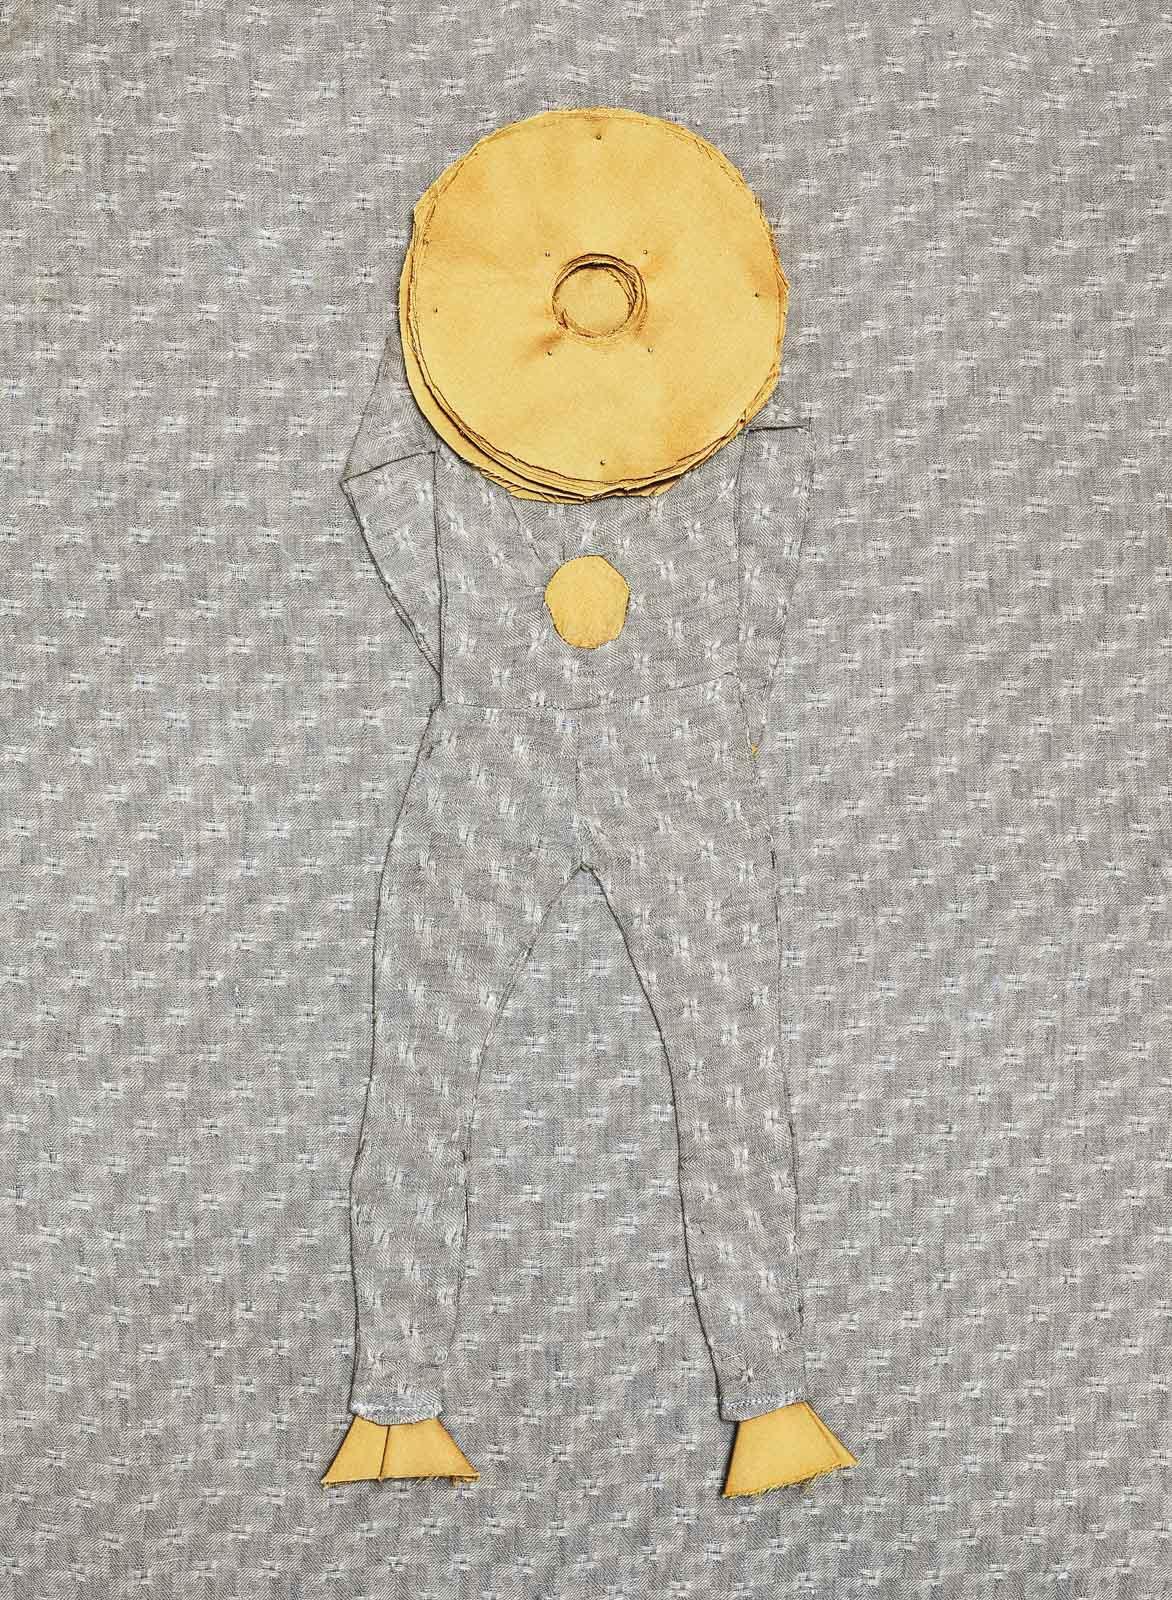 Éva Mag, Archive 7, 2015, Pigment print on acid-free cotton paper, 39 x 29 cm, Custom frame with museum glass, Edition 5 + 1 AP